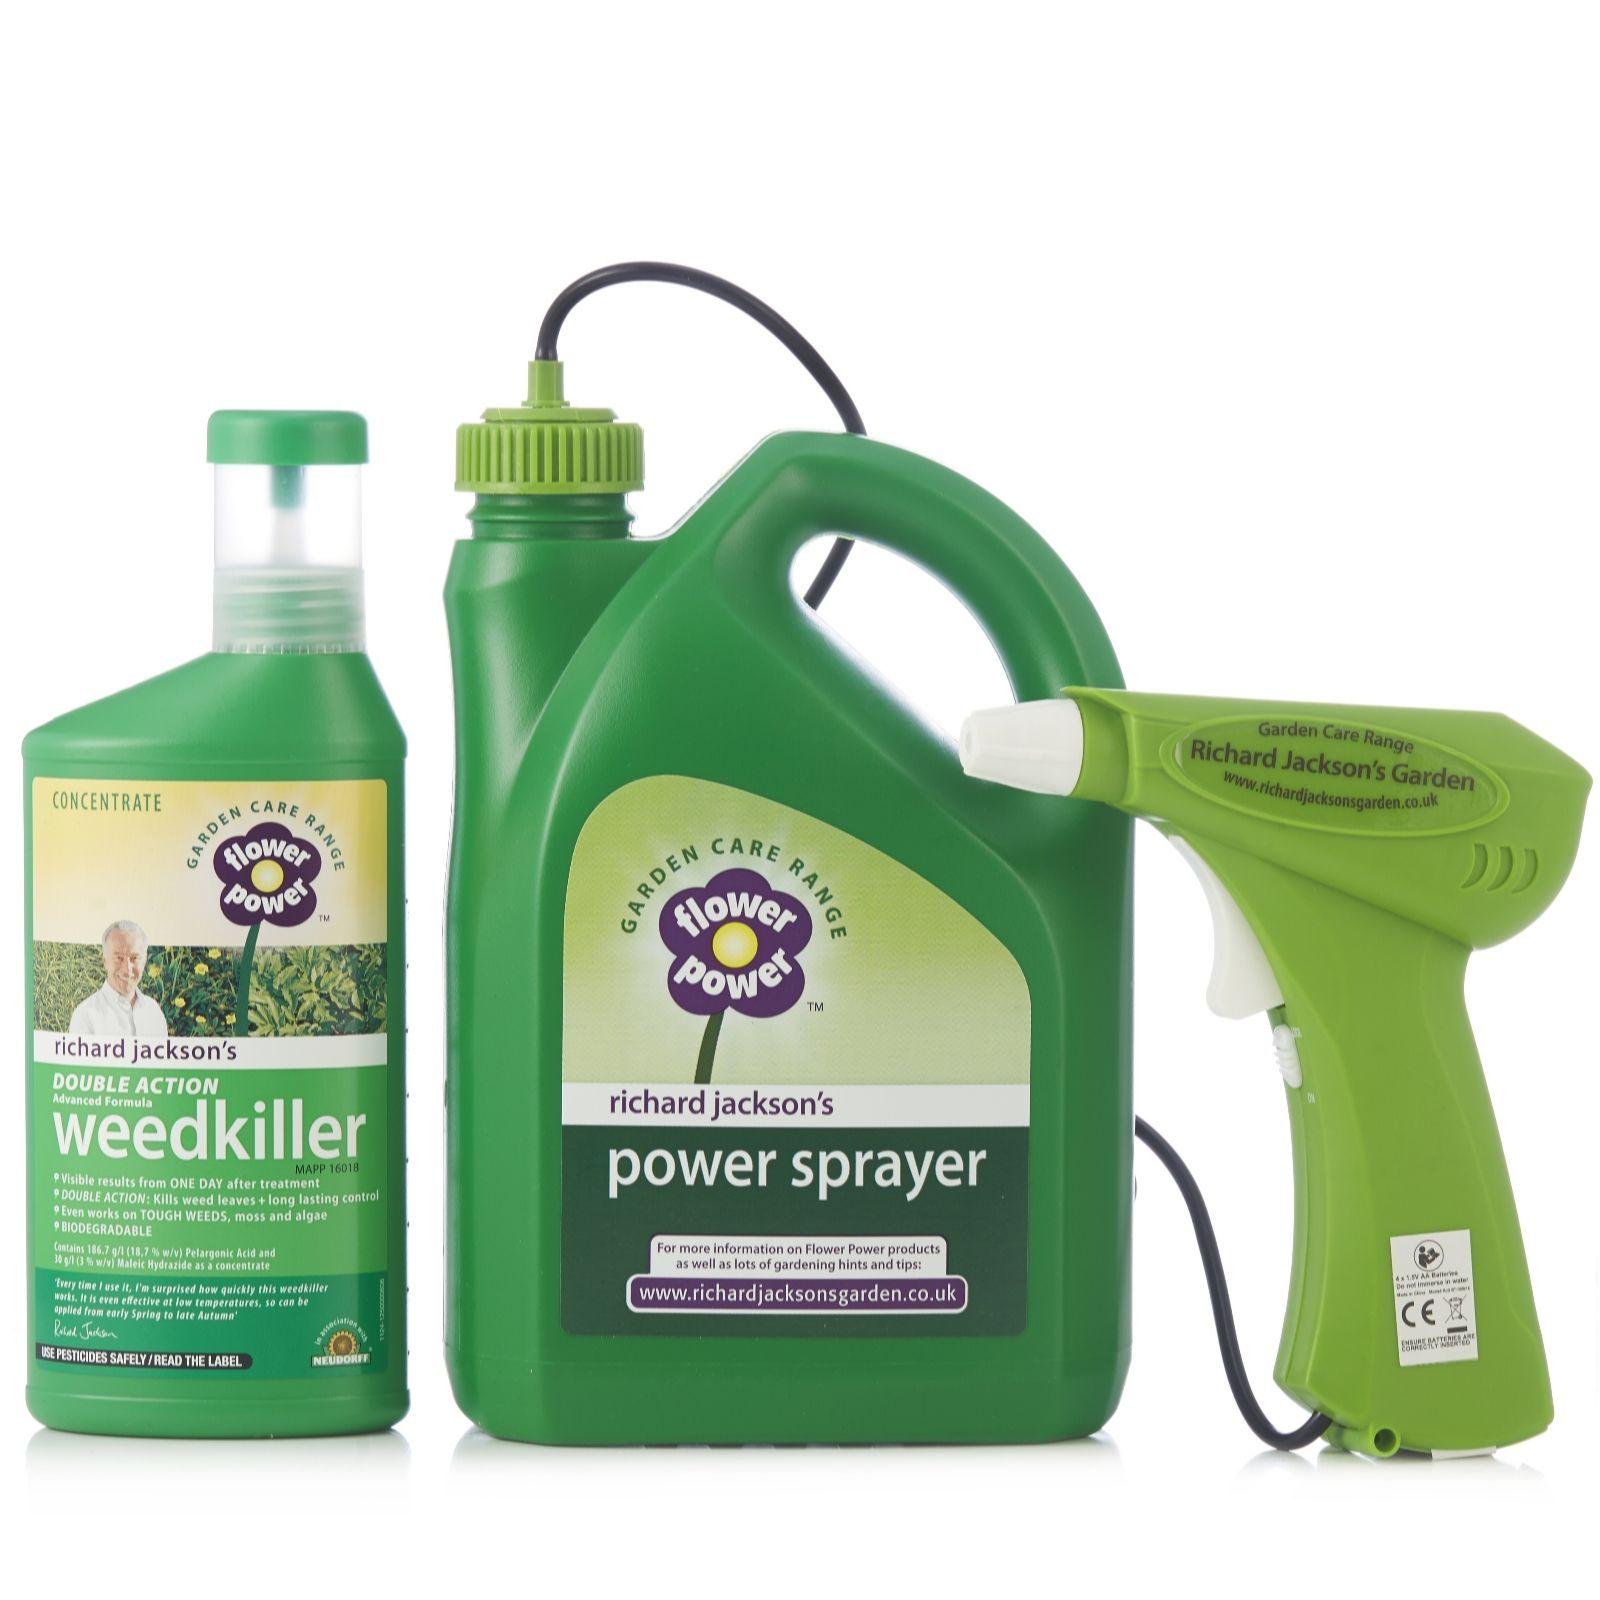 509041 Richard Jackson Power Sprayer Weedkiller Kit Qvc Price